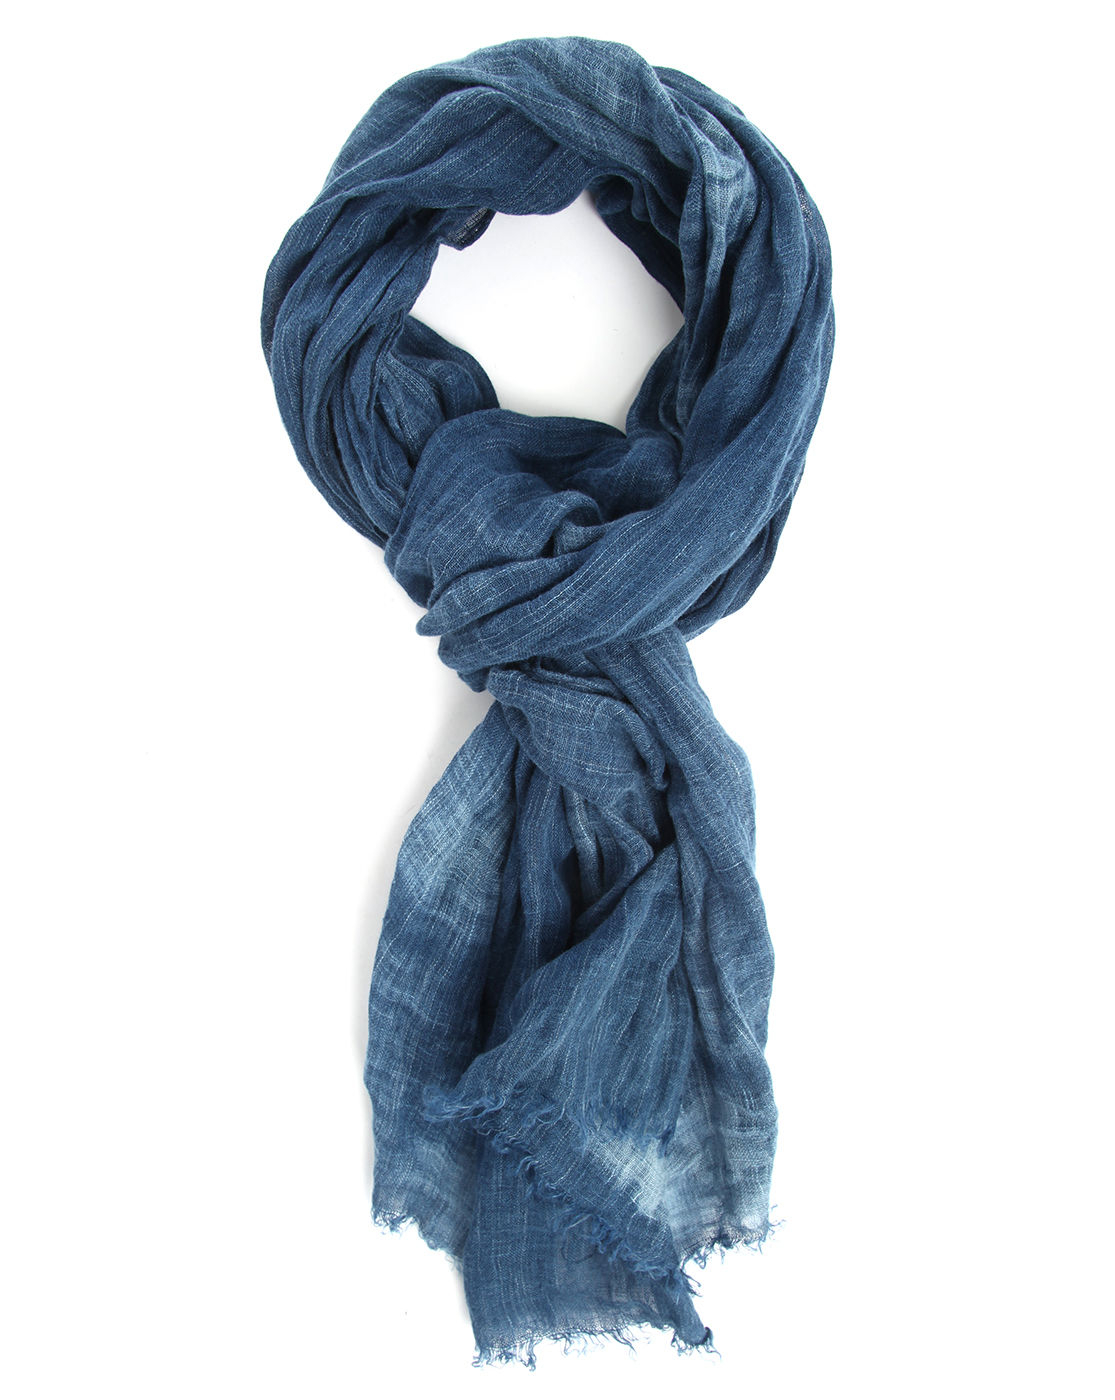 hilfiger dyed indigo blue scarf in blue for